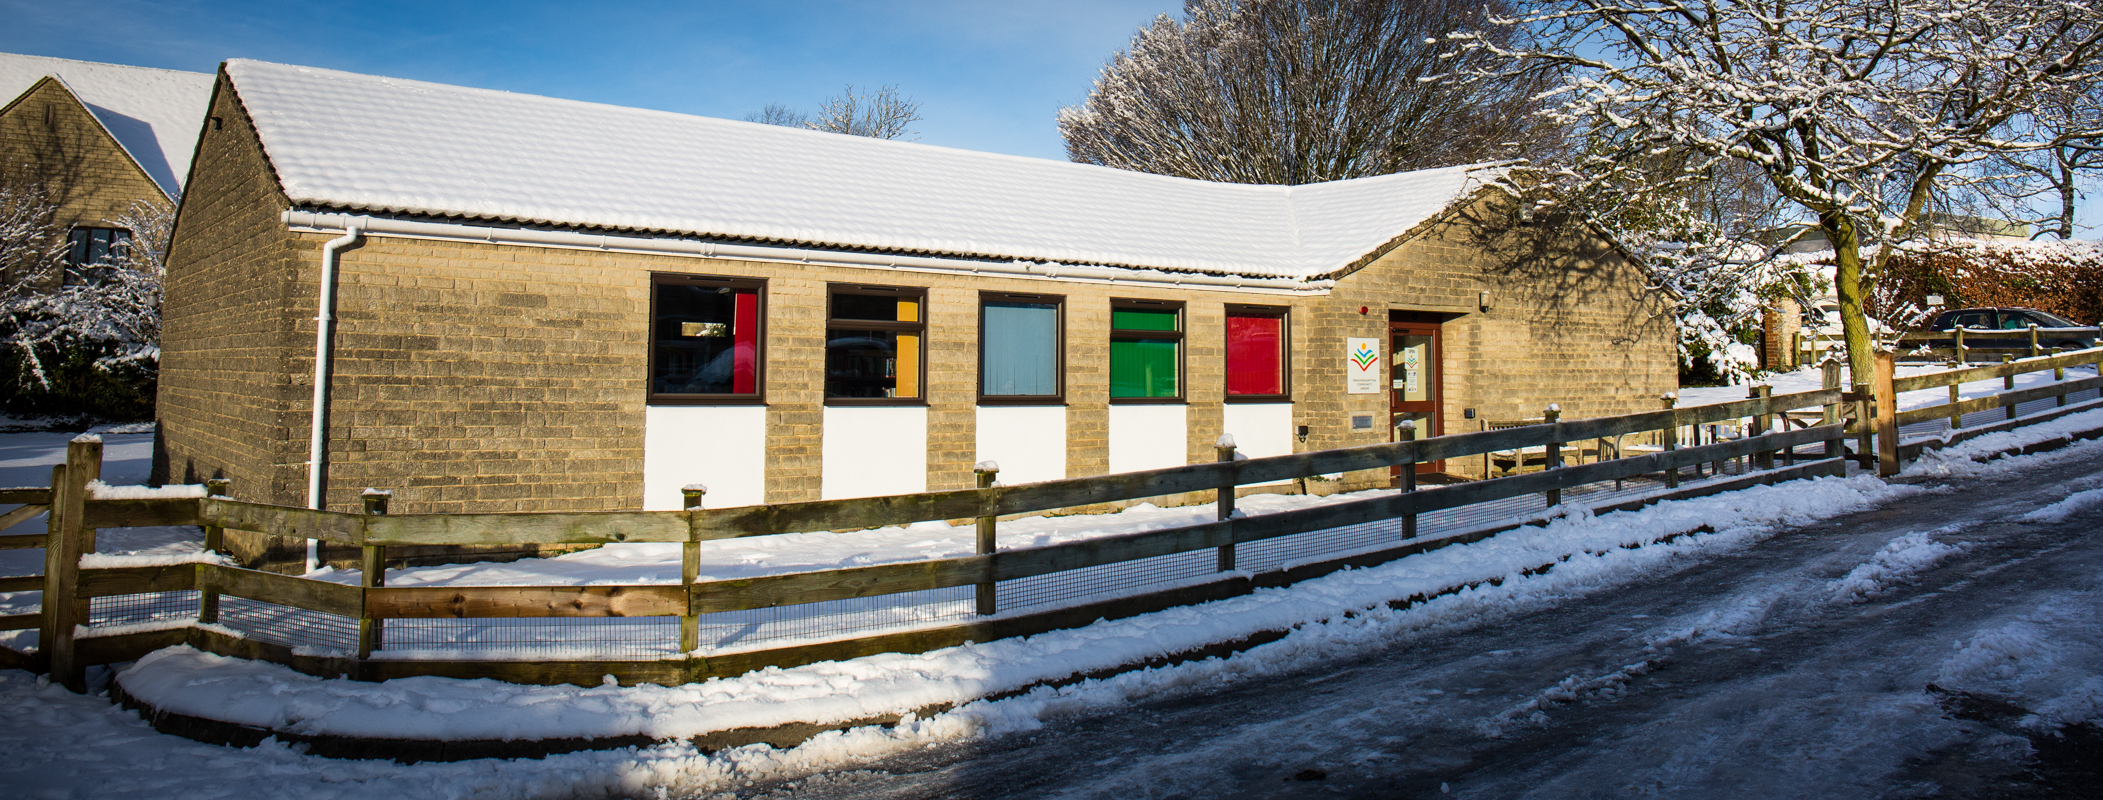 Minchinhampton Community Library in the snow